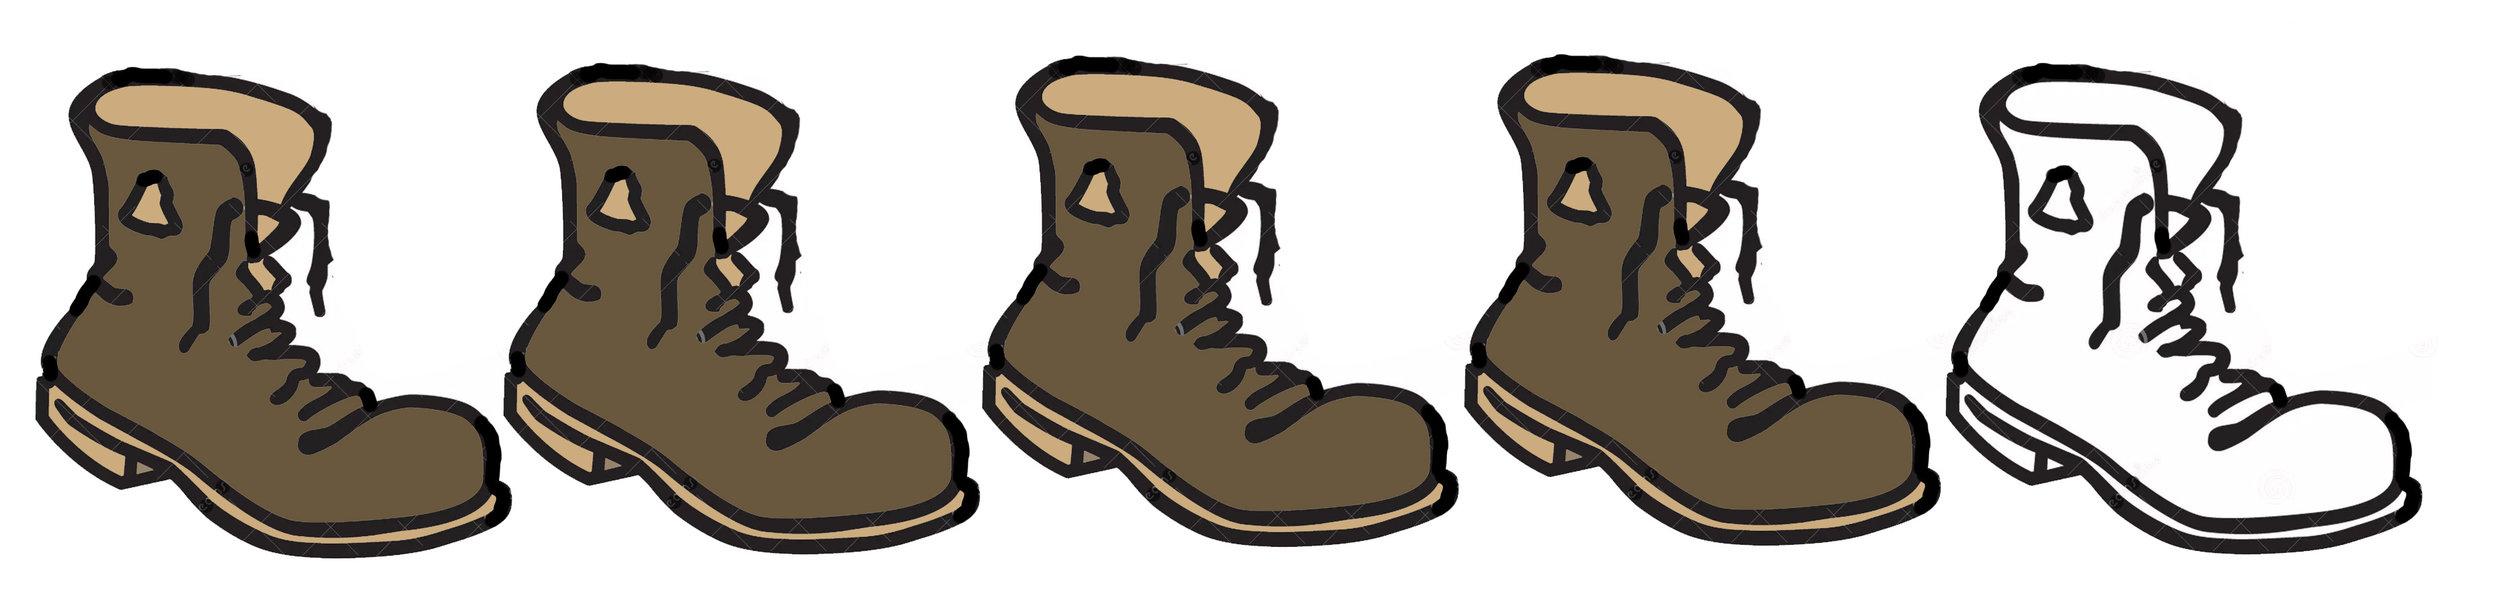 4 boot.jpg